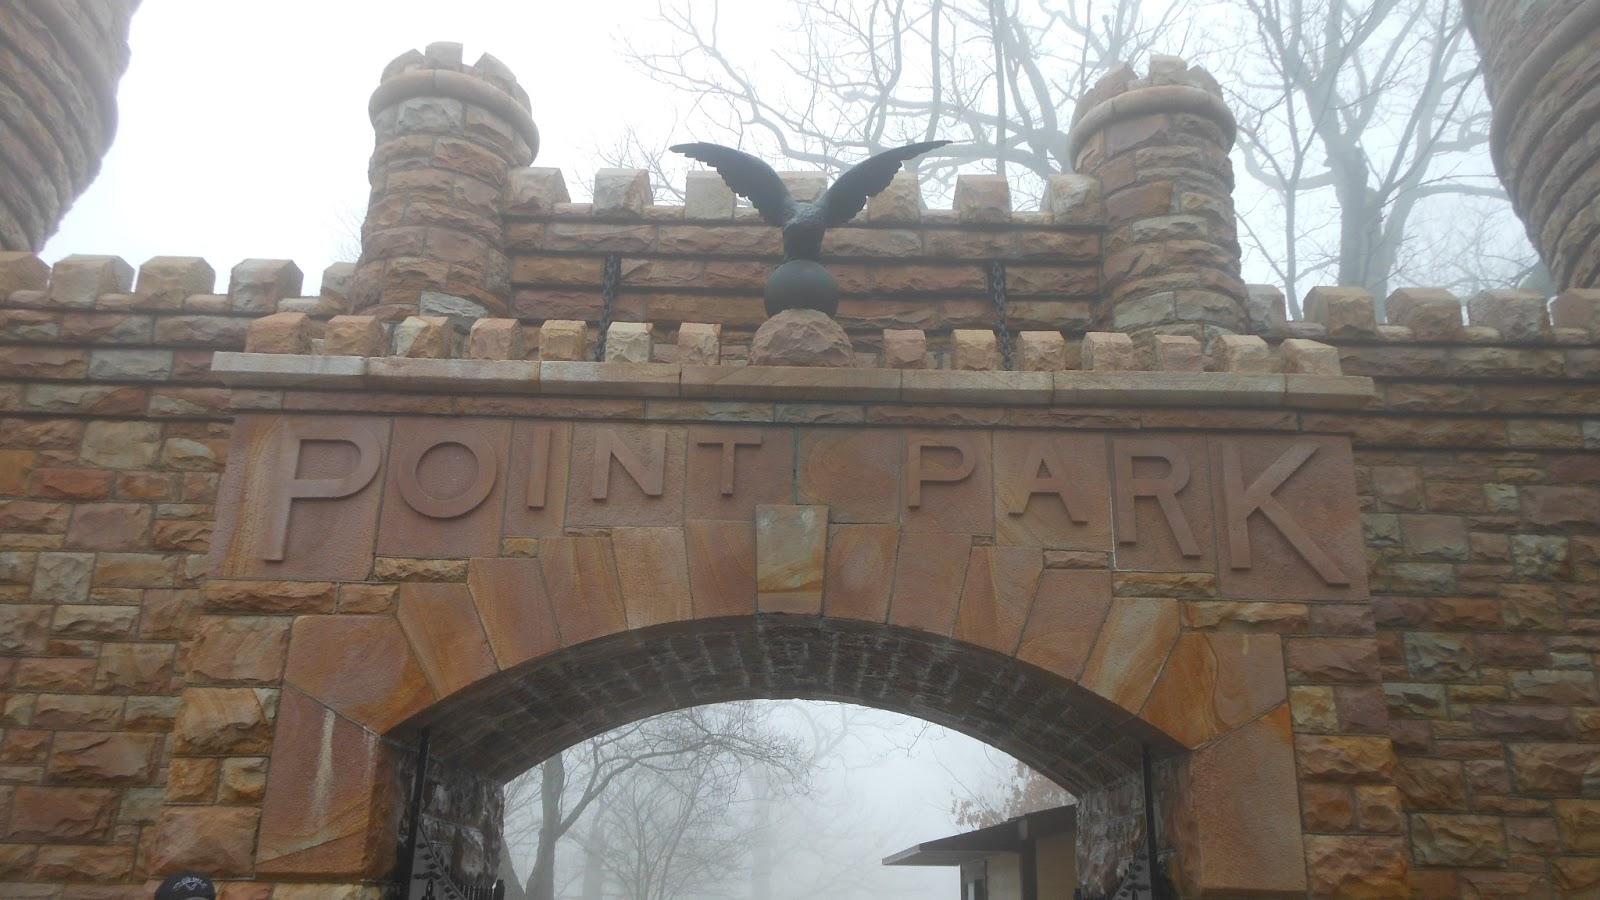 Point Park sign